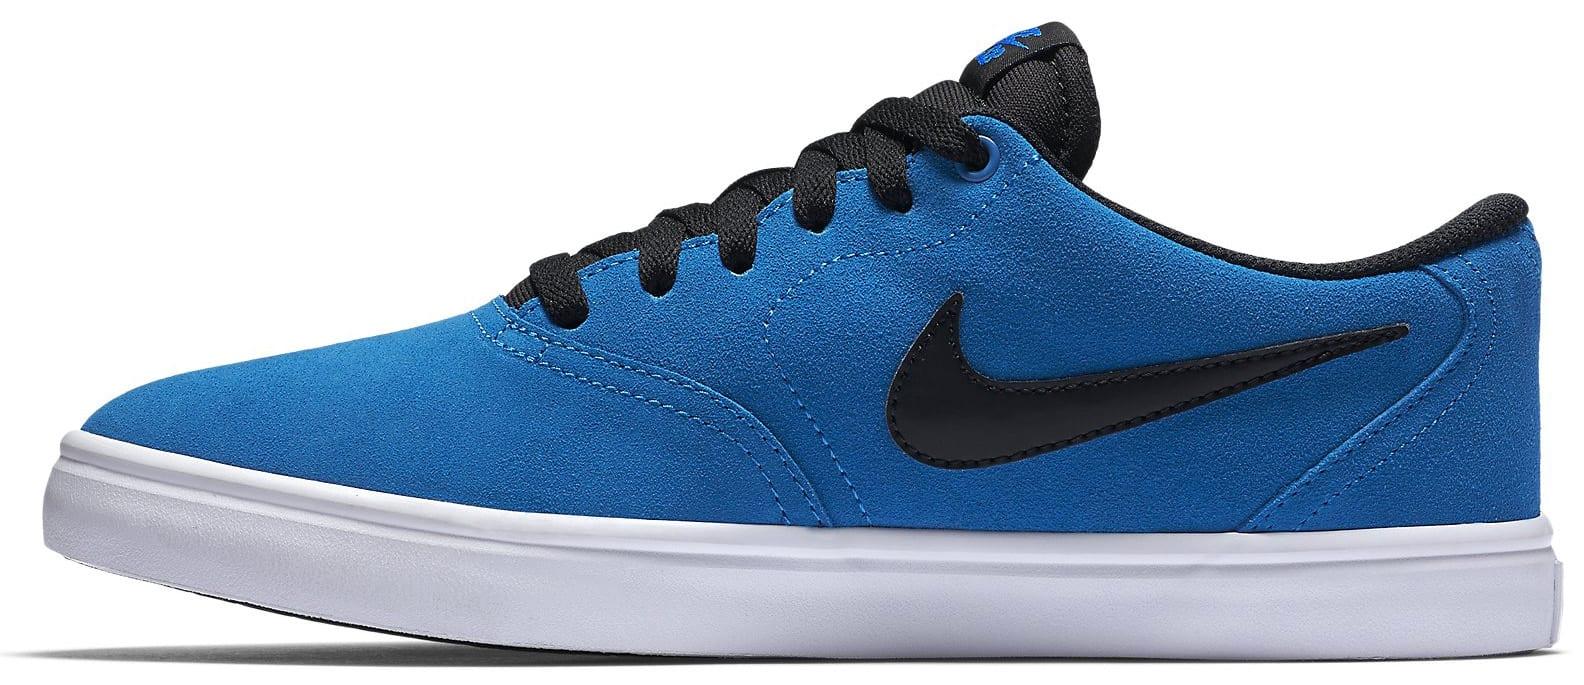 6d10229f421ee8 Nike SB Check Solar Skate Shoes - thumbnail 2